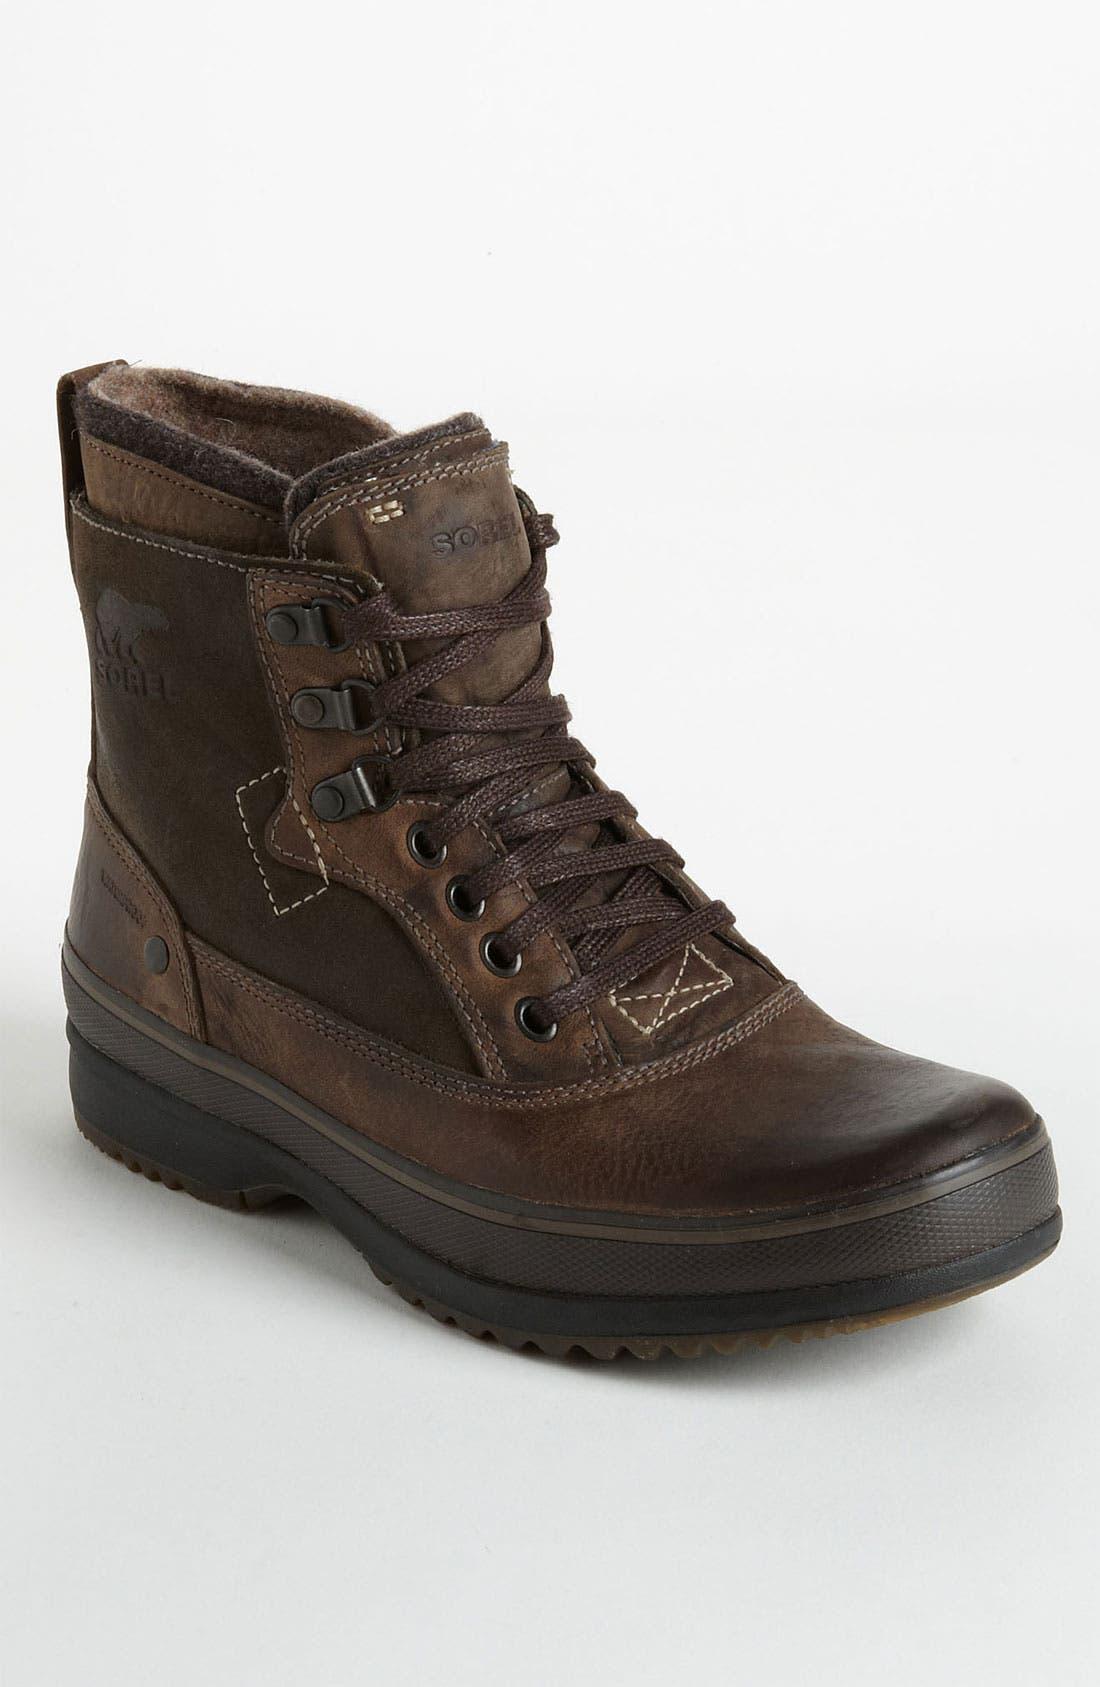 Main Image - Sorel 'Brimley' Boot